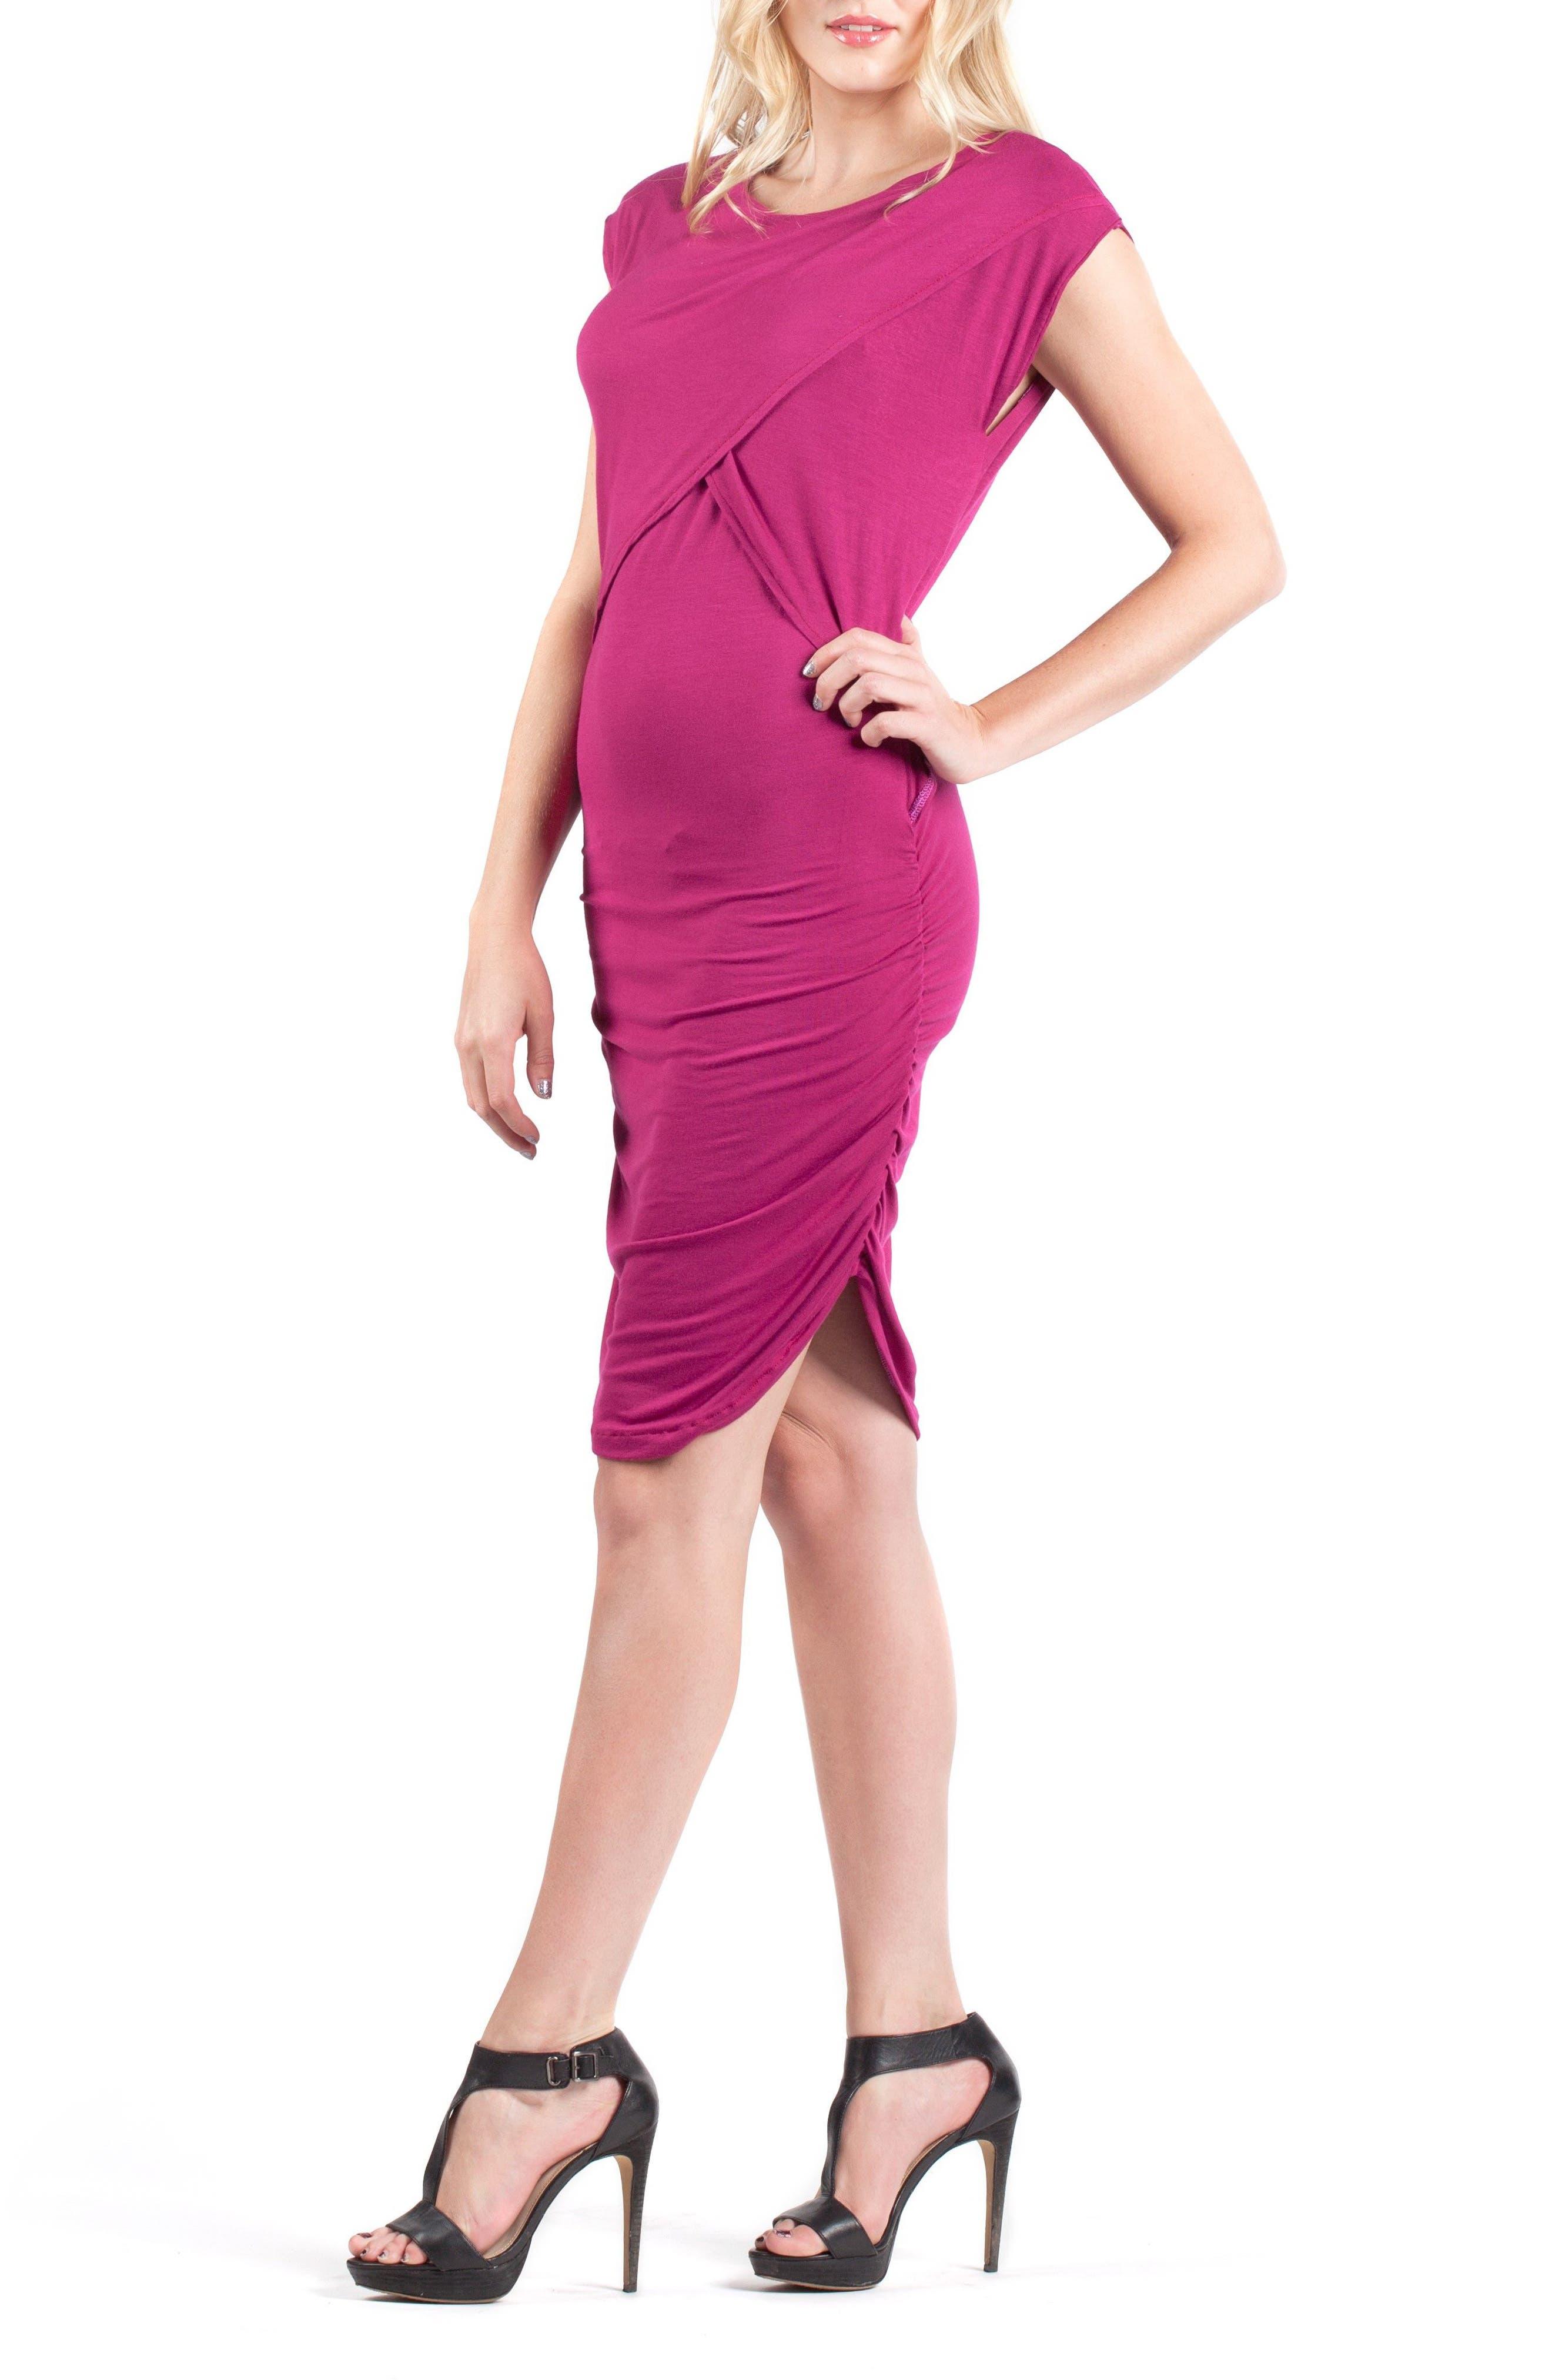 Savi Mom Miami Crossover Maternity/nursing Sheath Dress